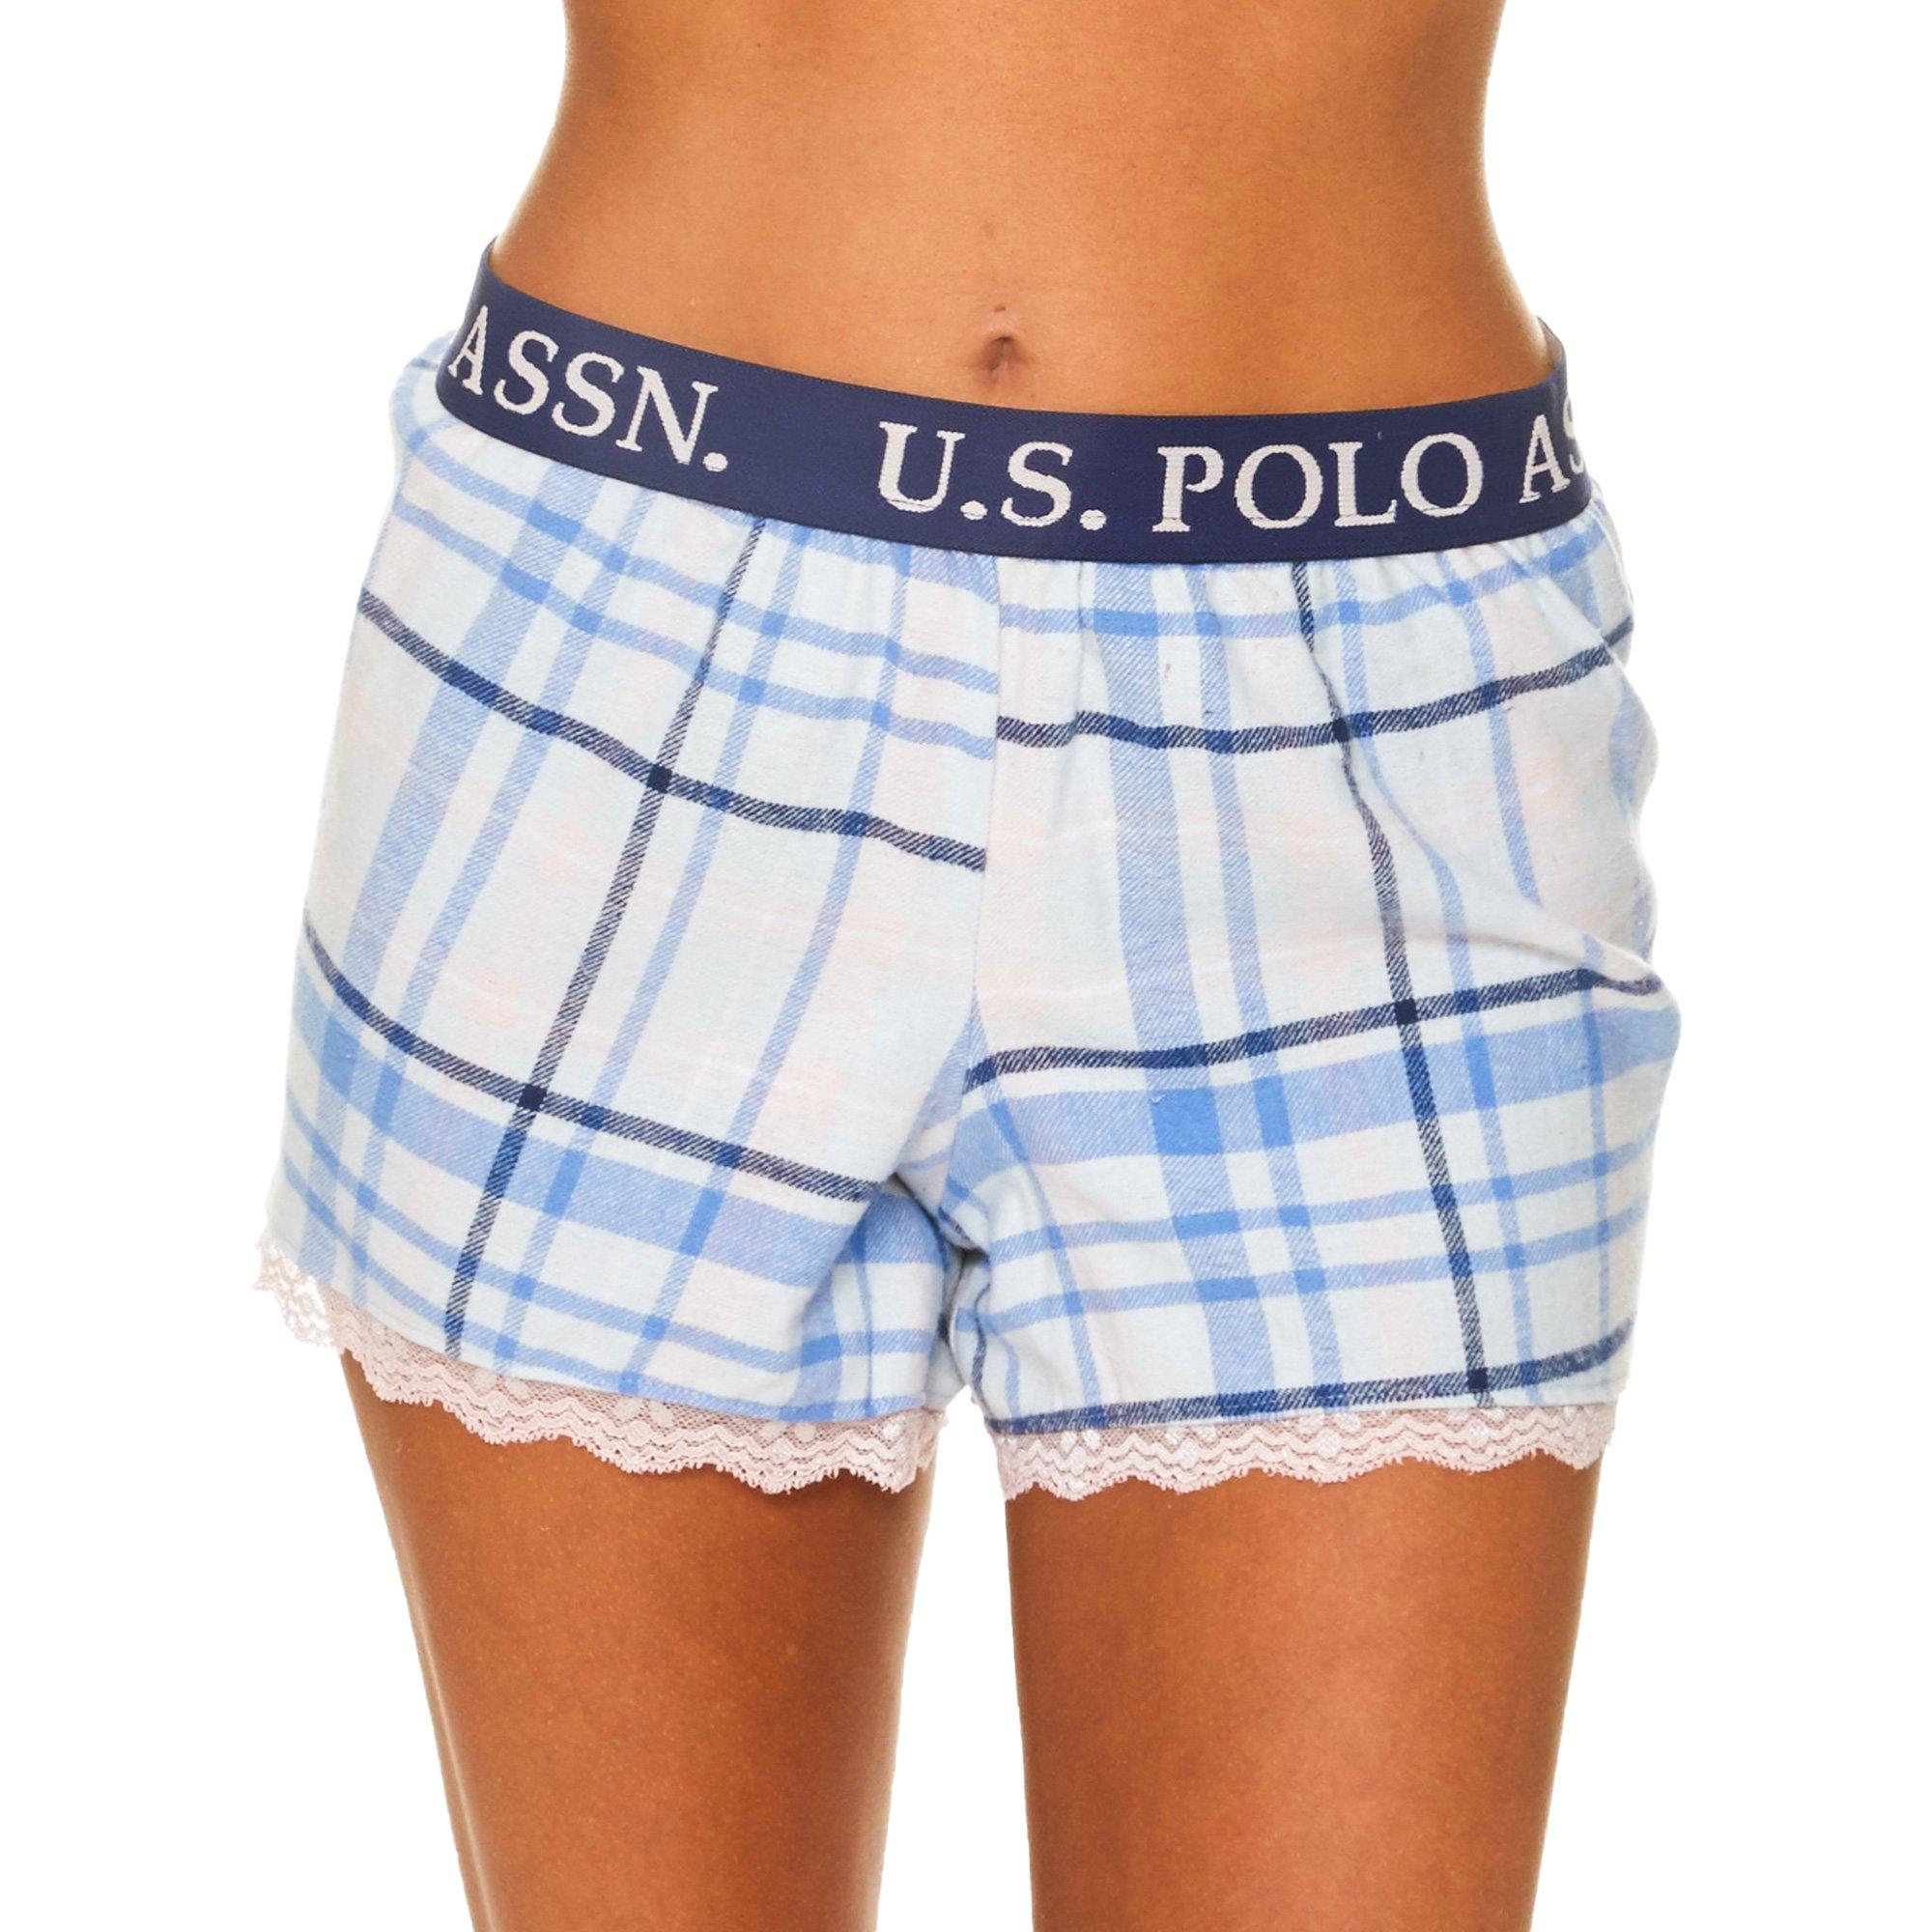 U.S. Polo Assn.. Womens Plaid Flannel Pajama Lounge Shorts with Lace Trim Light Blue Large